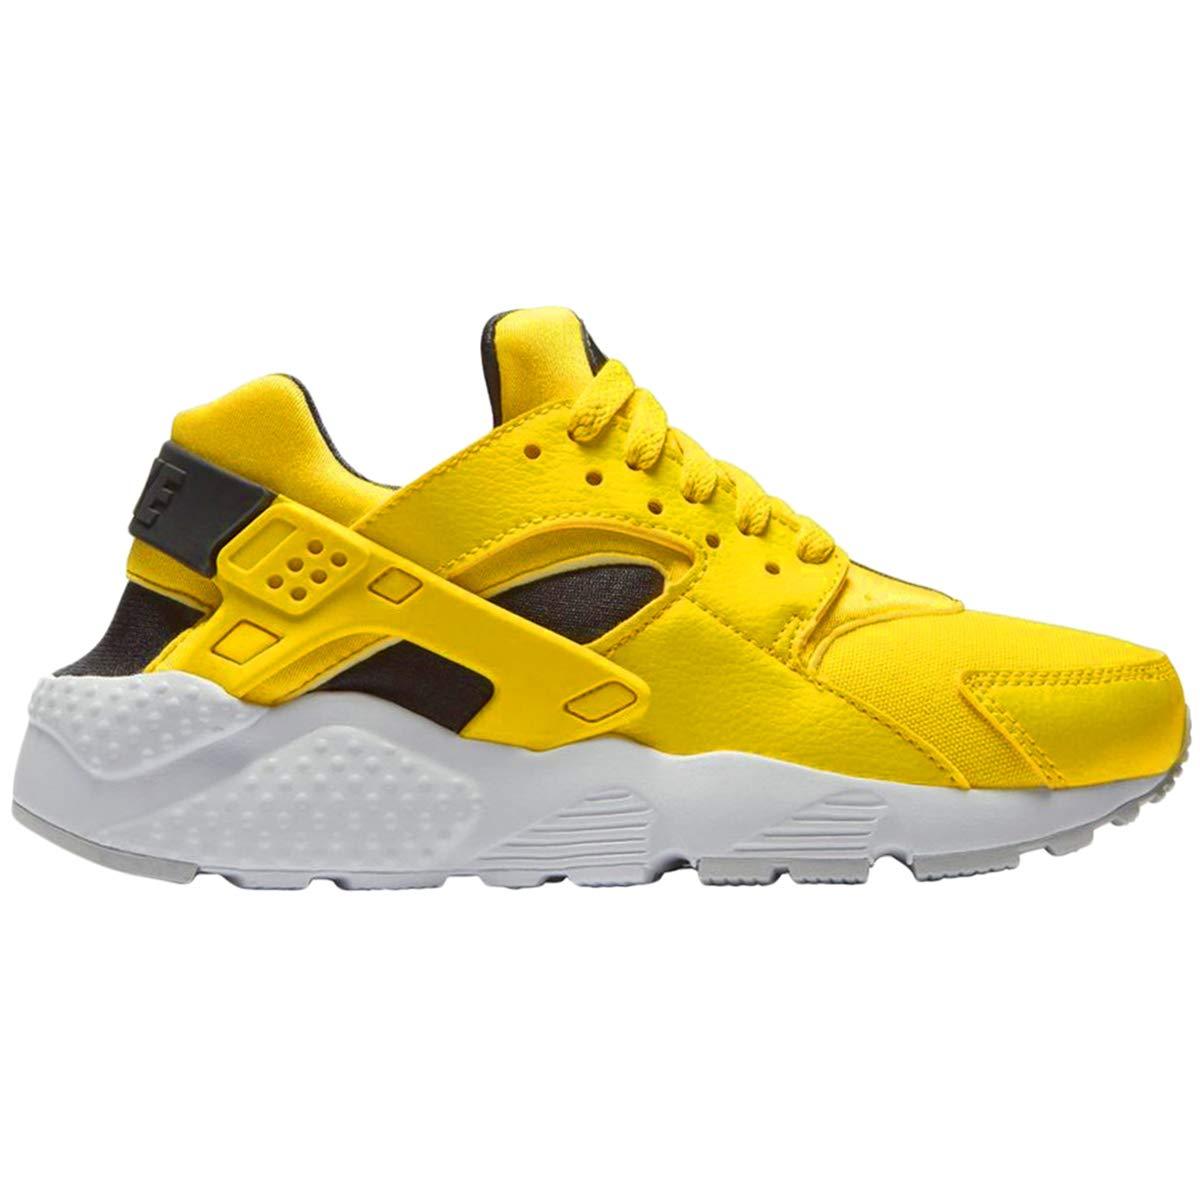 b47122164ec7 Galleon - Nike Youth Hurache Run GS Textile Yellow Anthracite White  Trainers 4.5 US